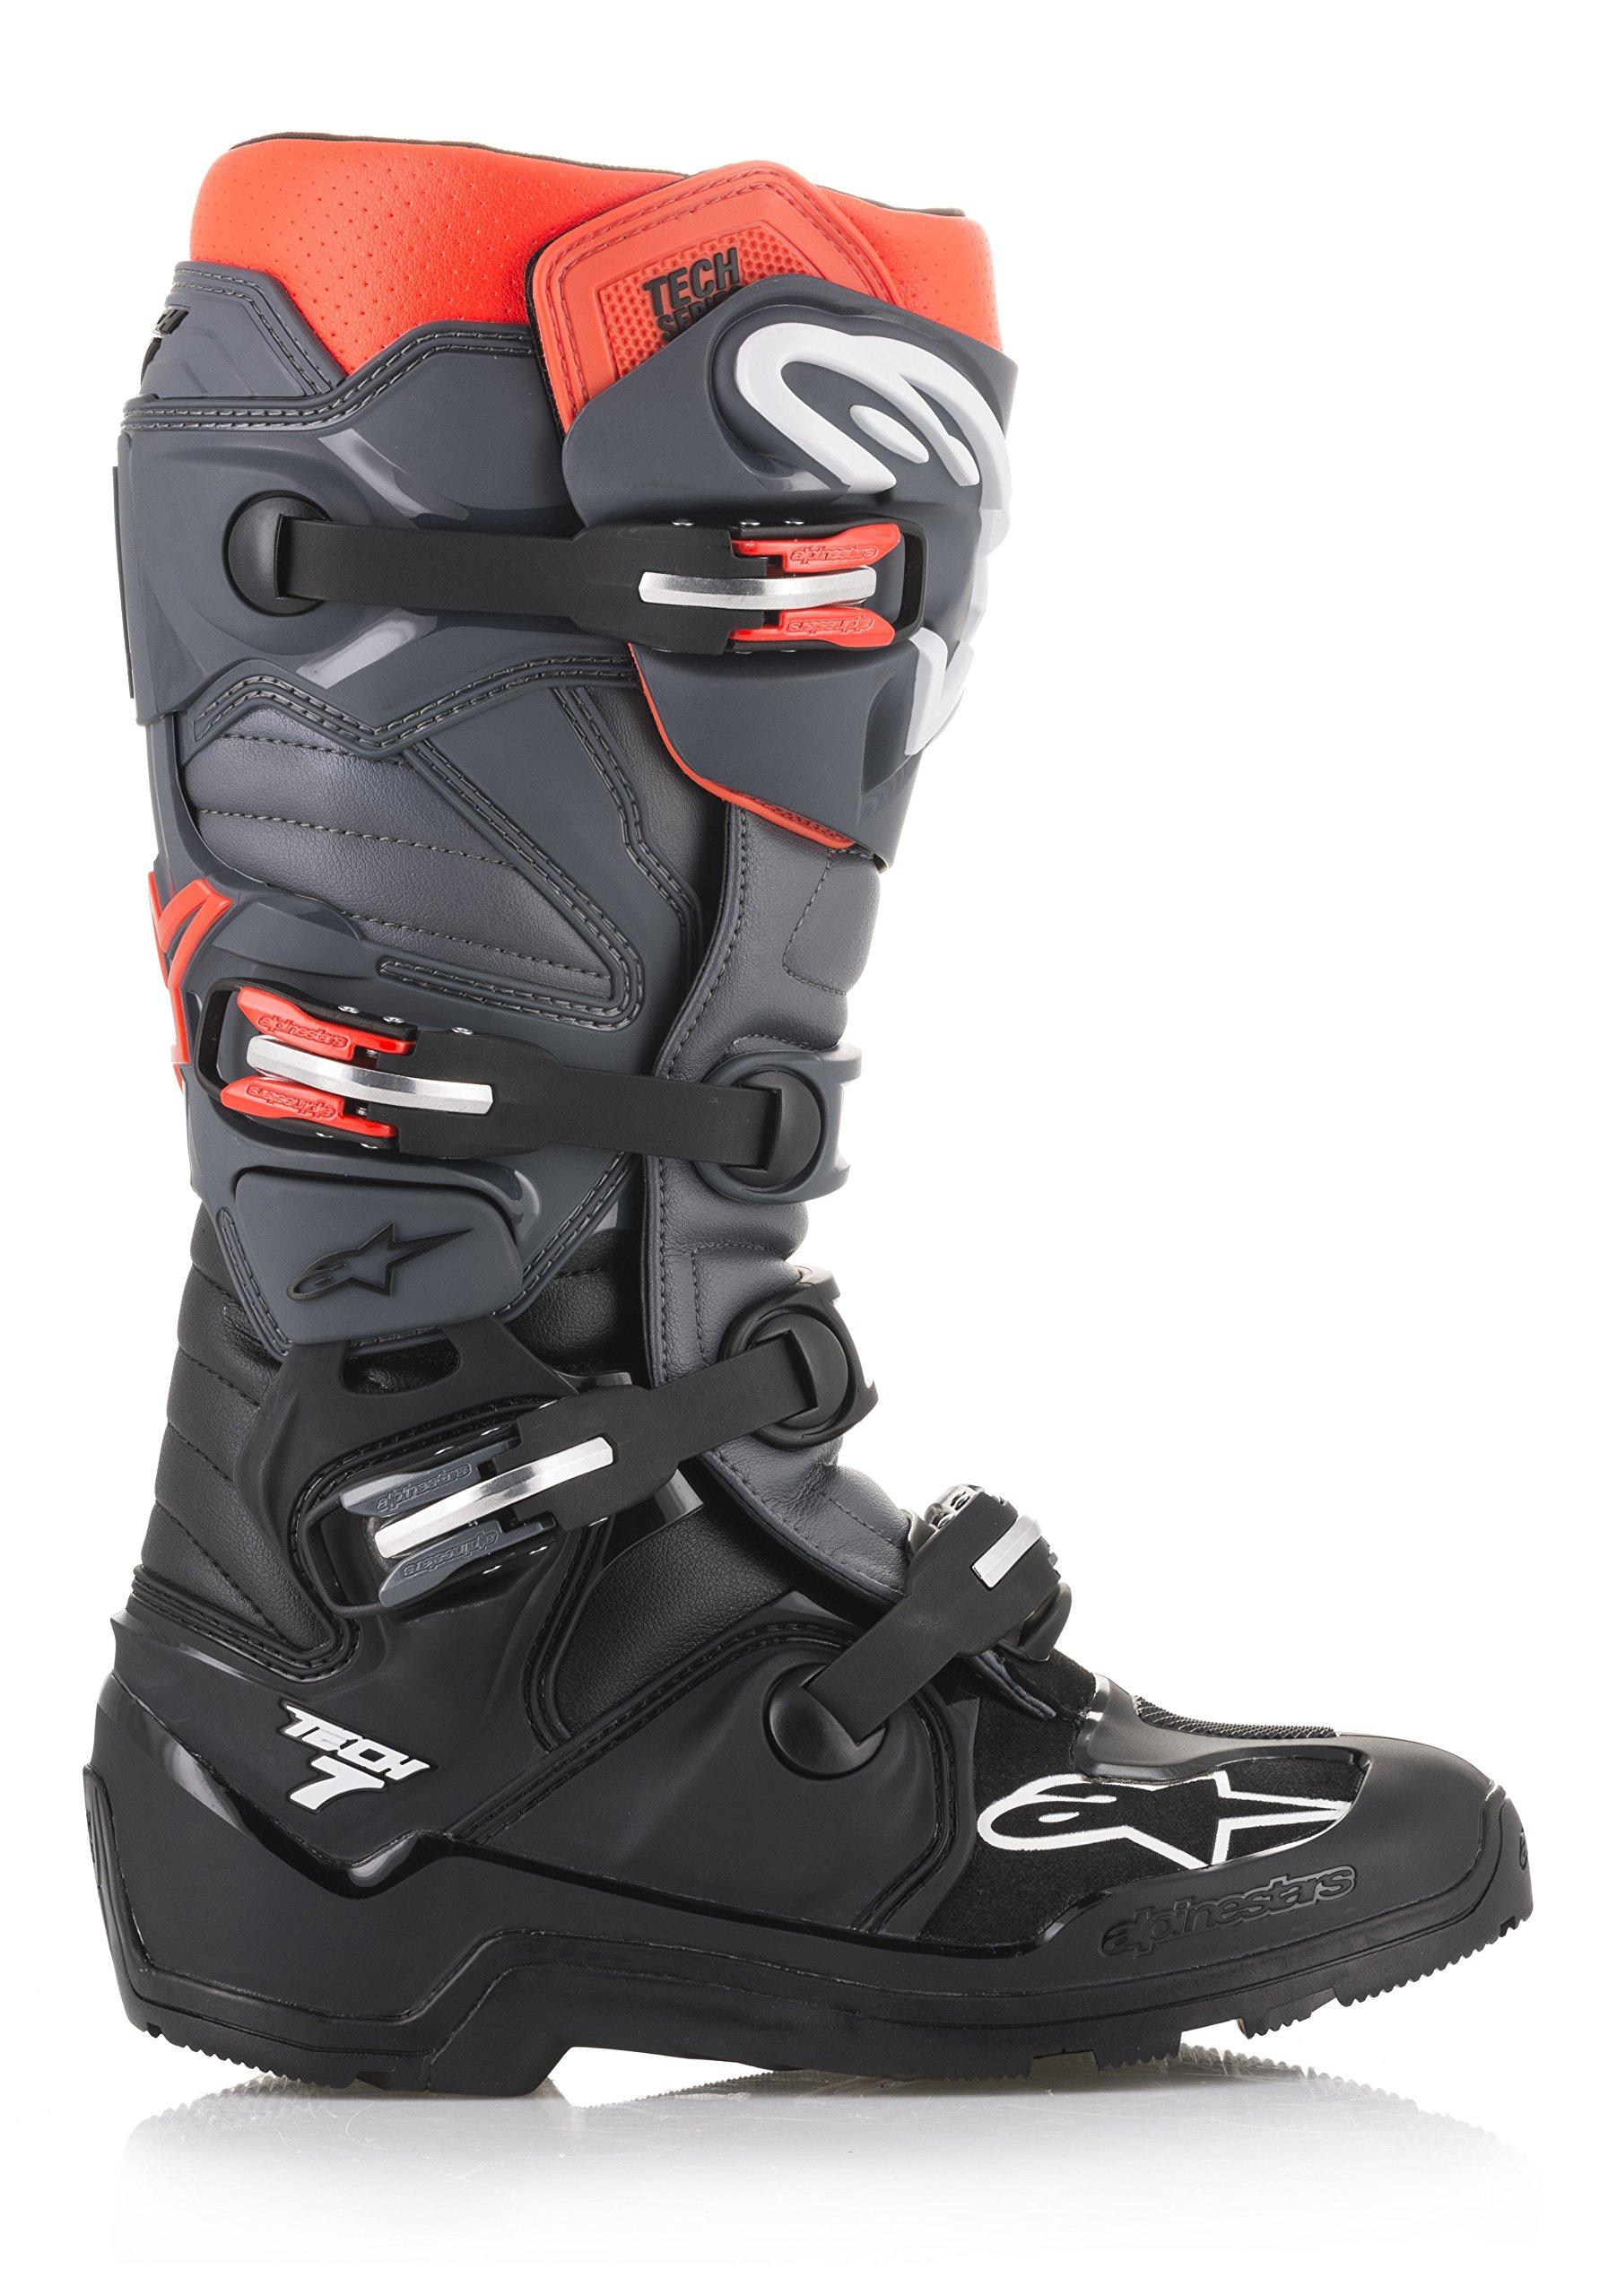 Tech 7 Enduro Off-Road Motocross Boot (13 US, Black Gray Red Fluo) by Alpinestars